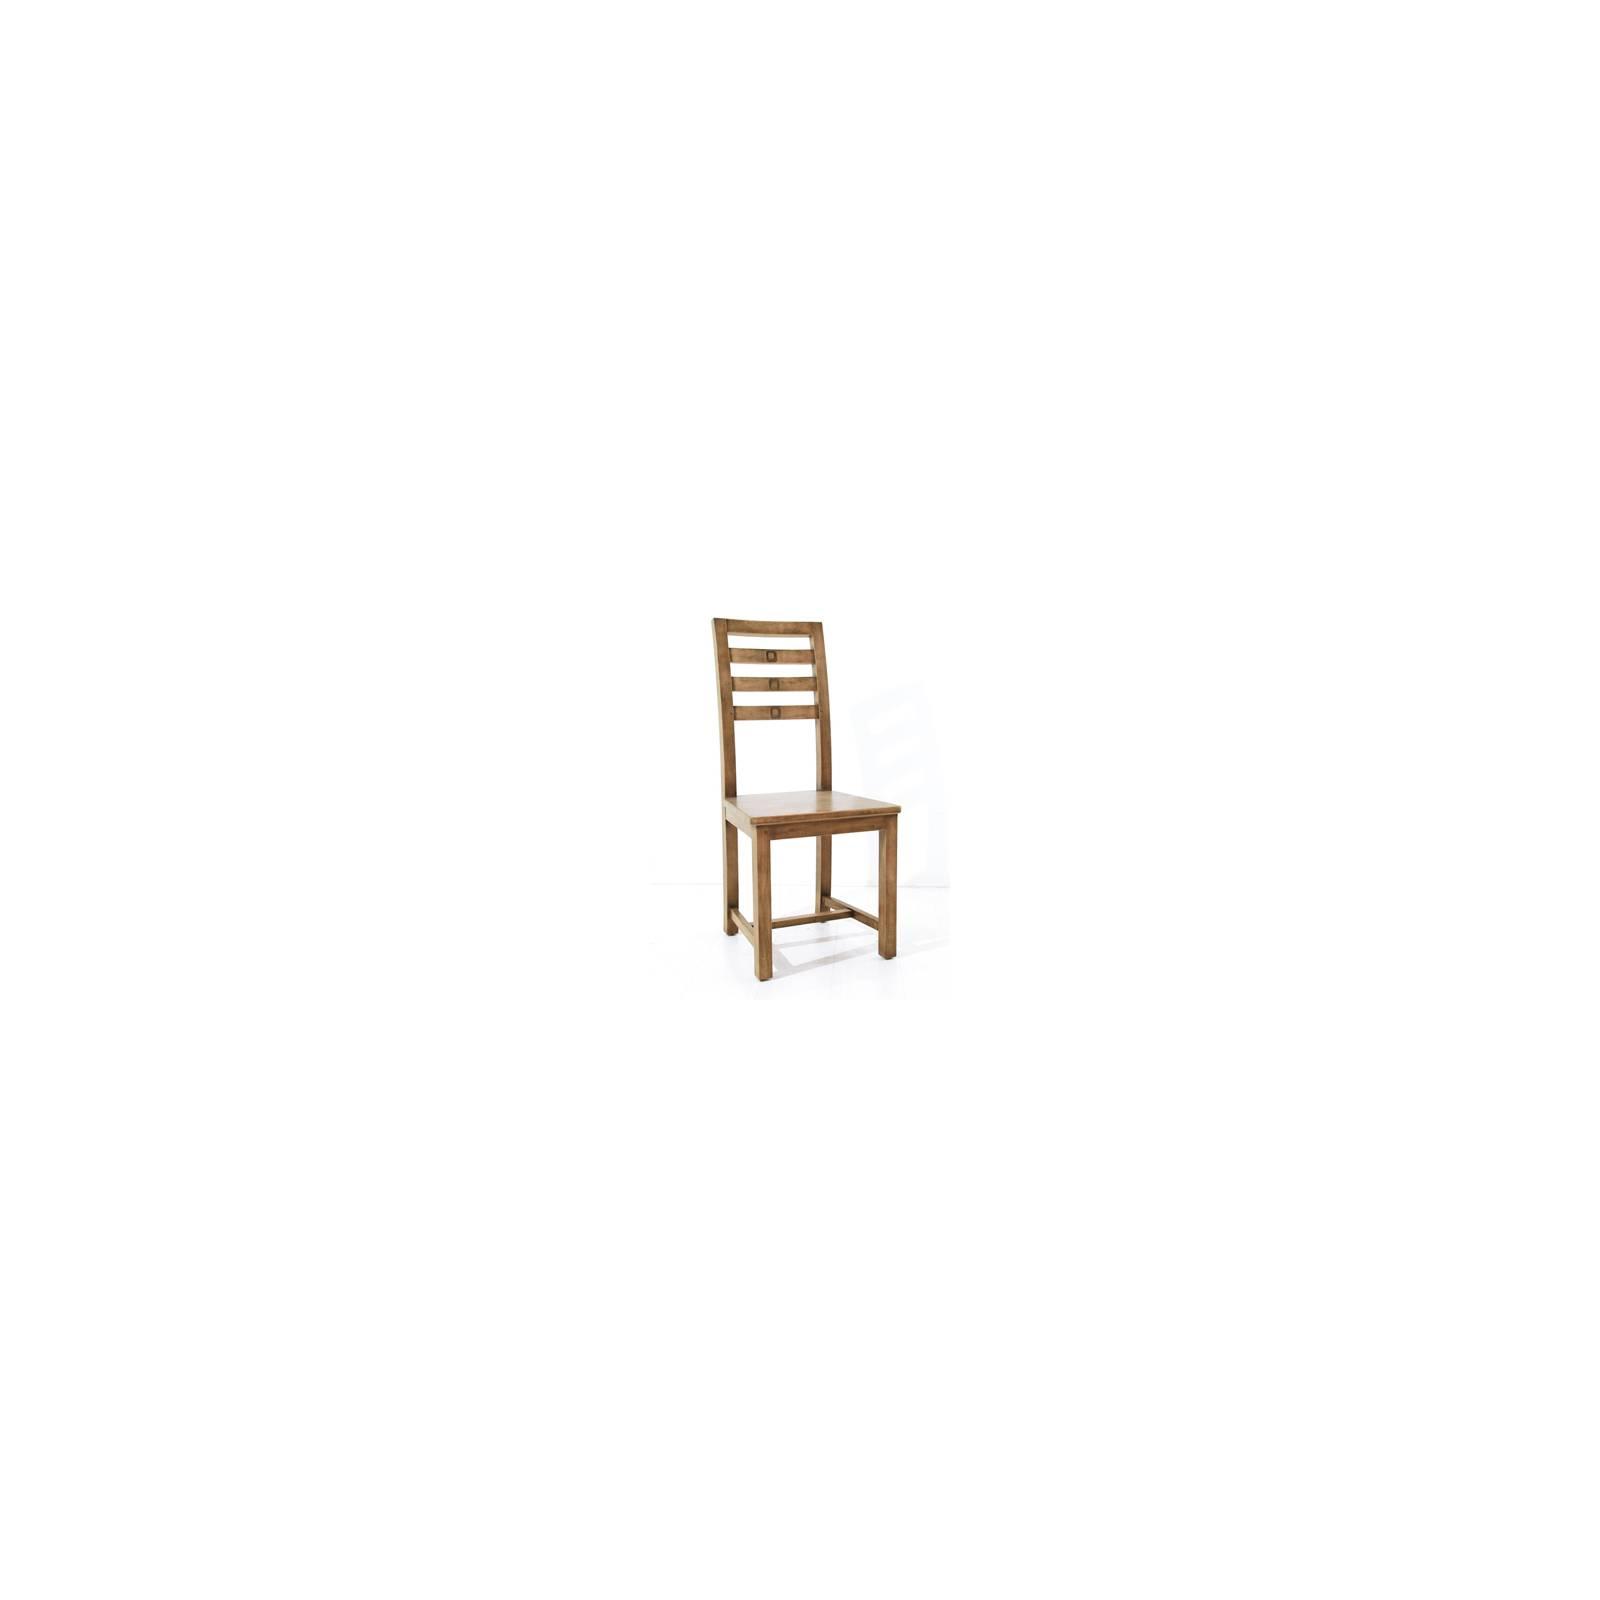 Chaise Tanoa Hévéa - mobilier bois massif